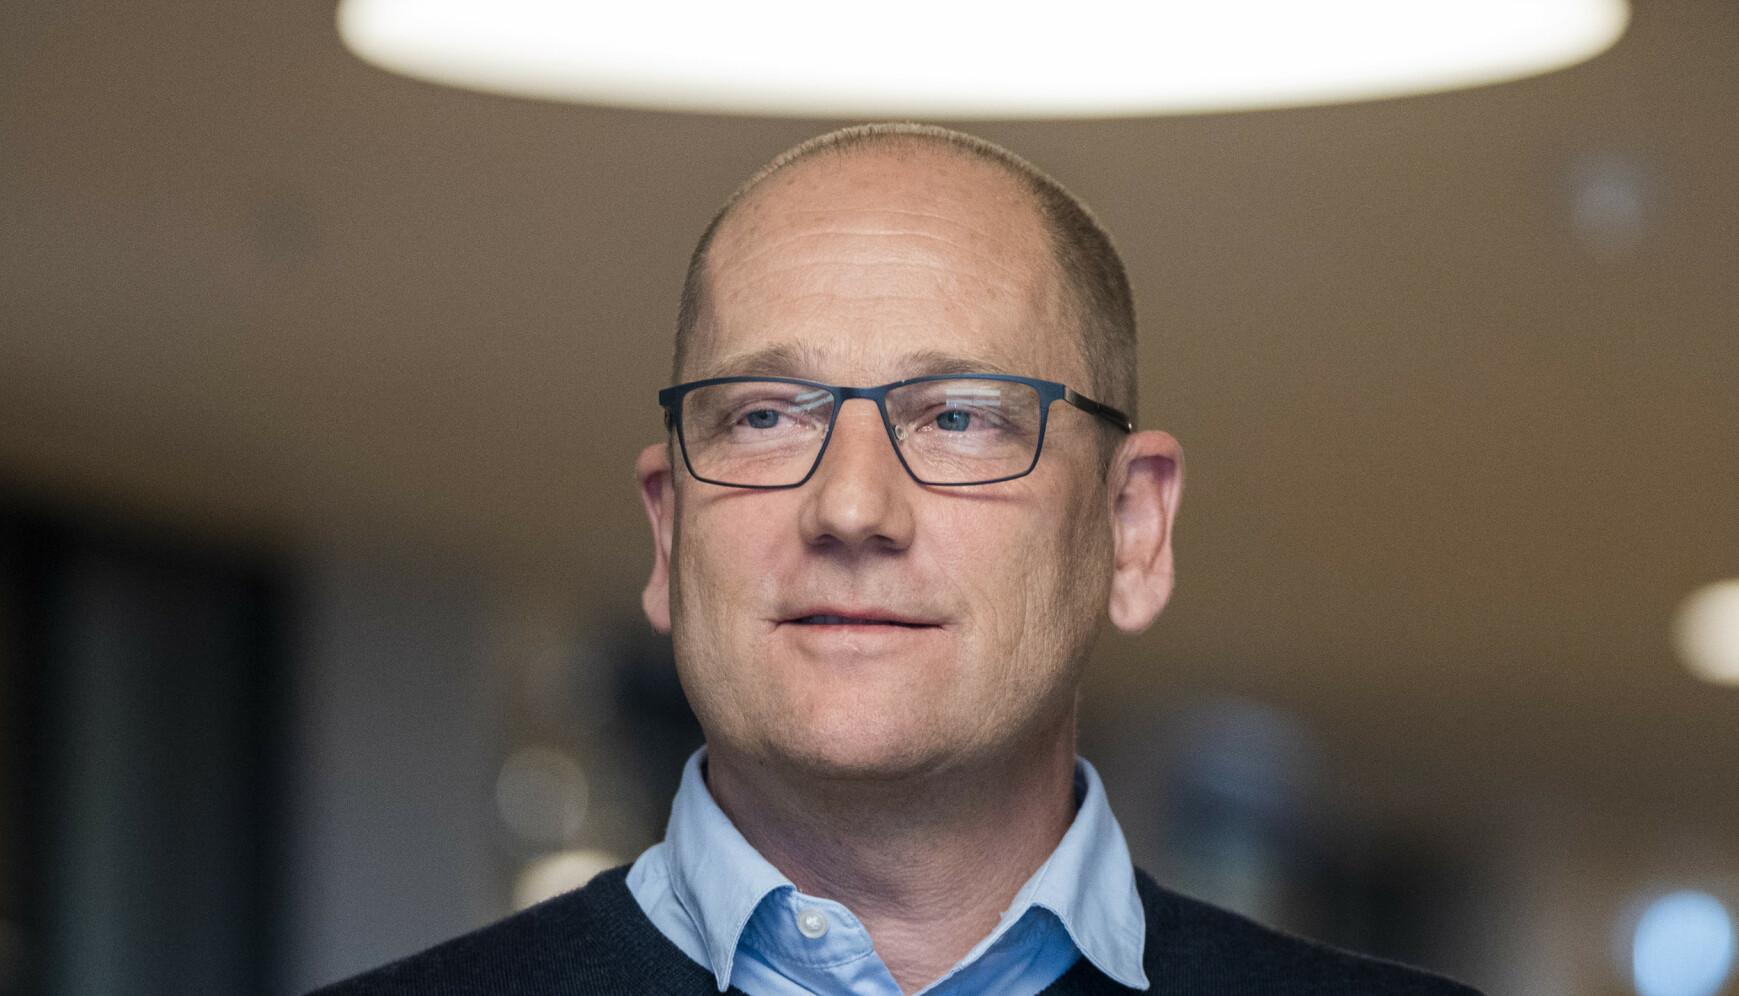 PÅ OVERTID: Leder i Utdanningsforbundet, Steffen Handal, mener at regjeringens beslutning kommer på overtid. Foto: Terje Pedersen / NTB